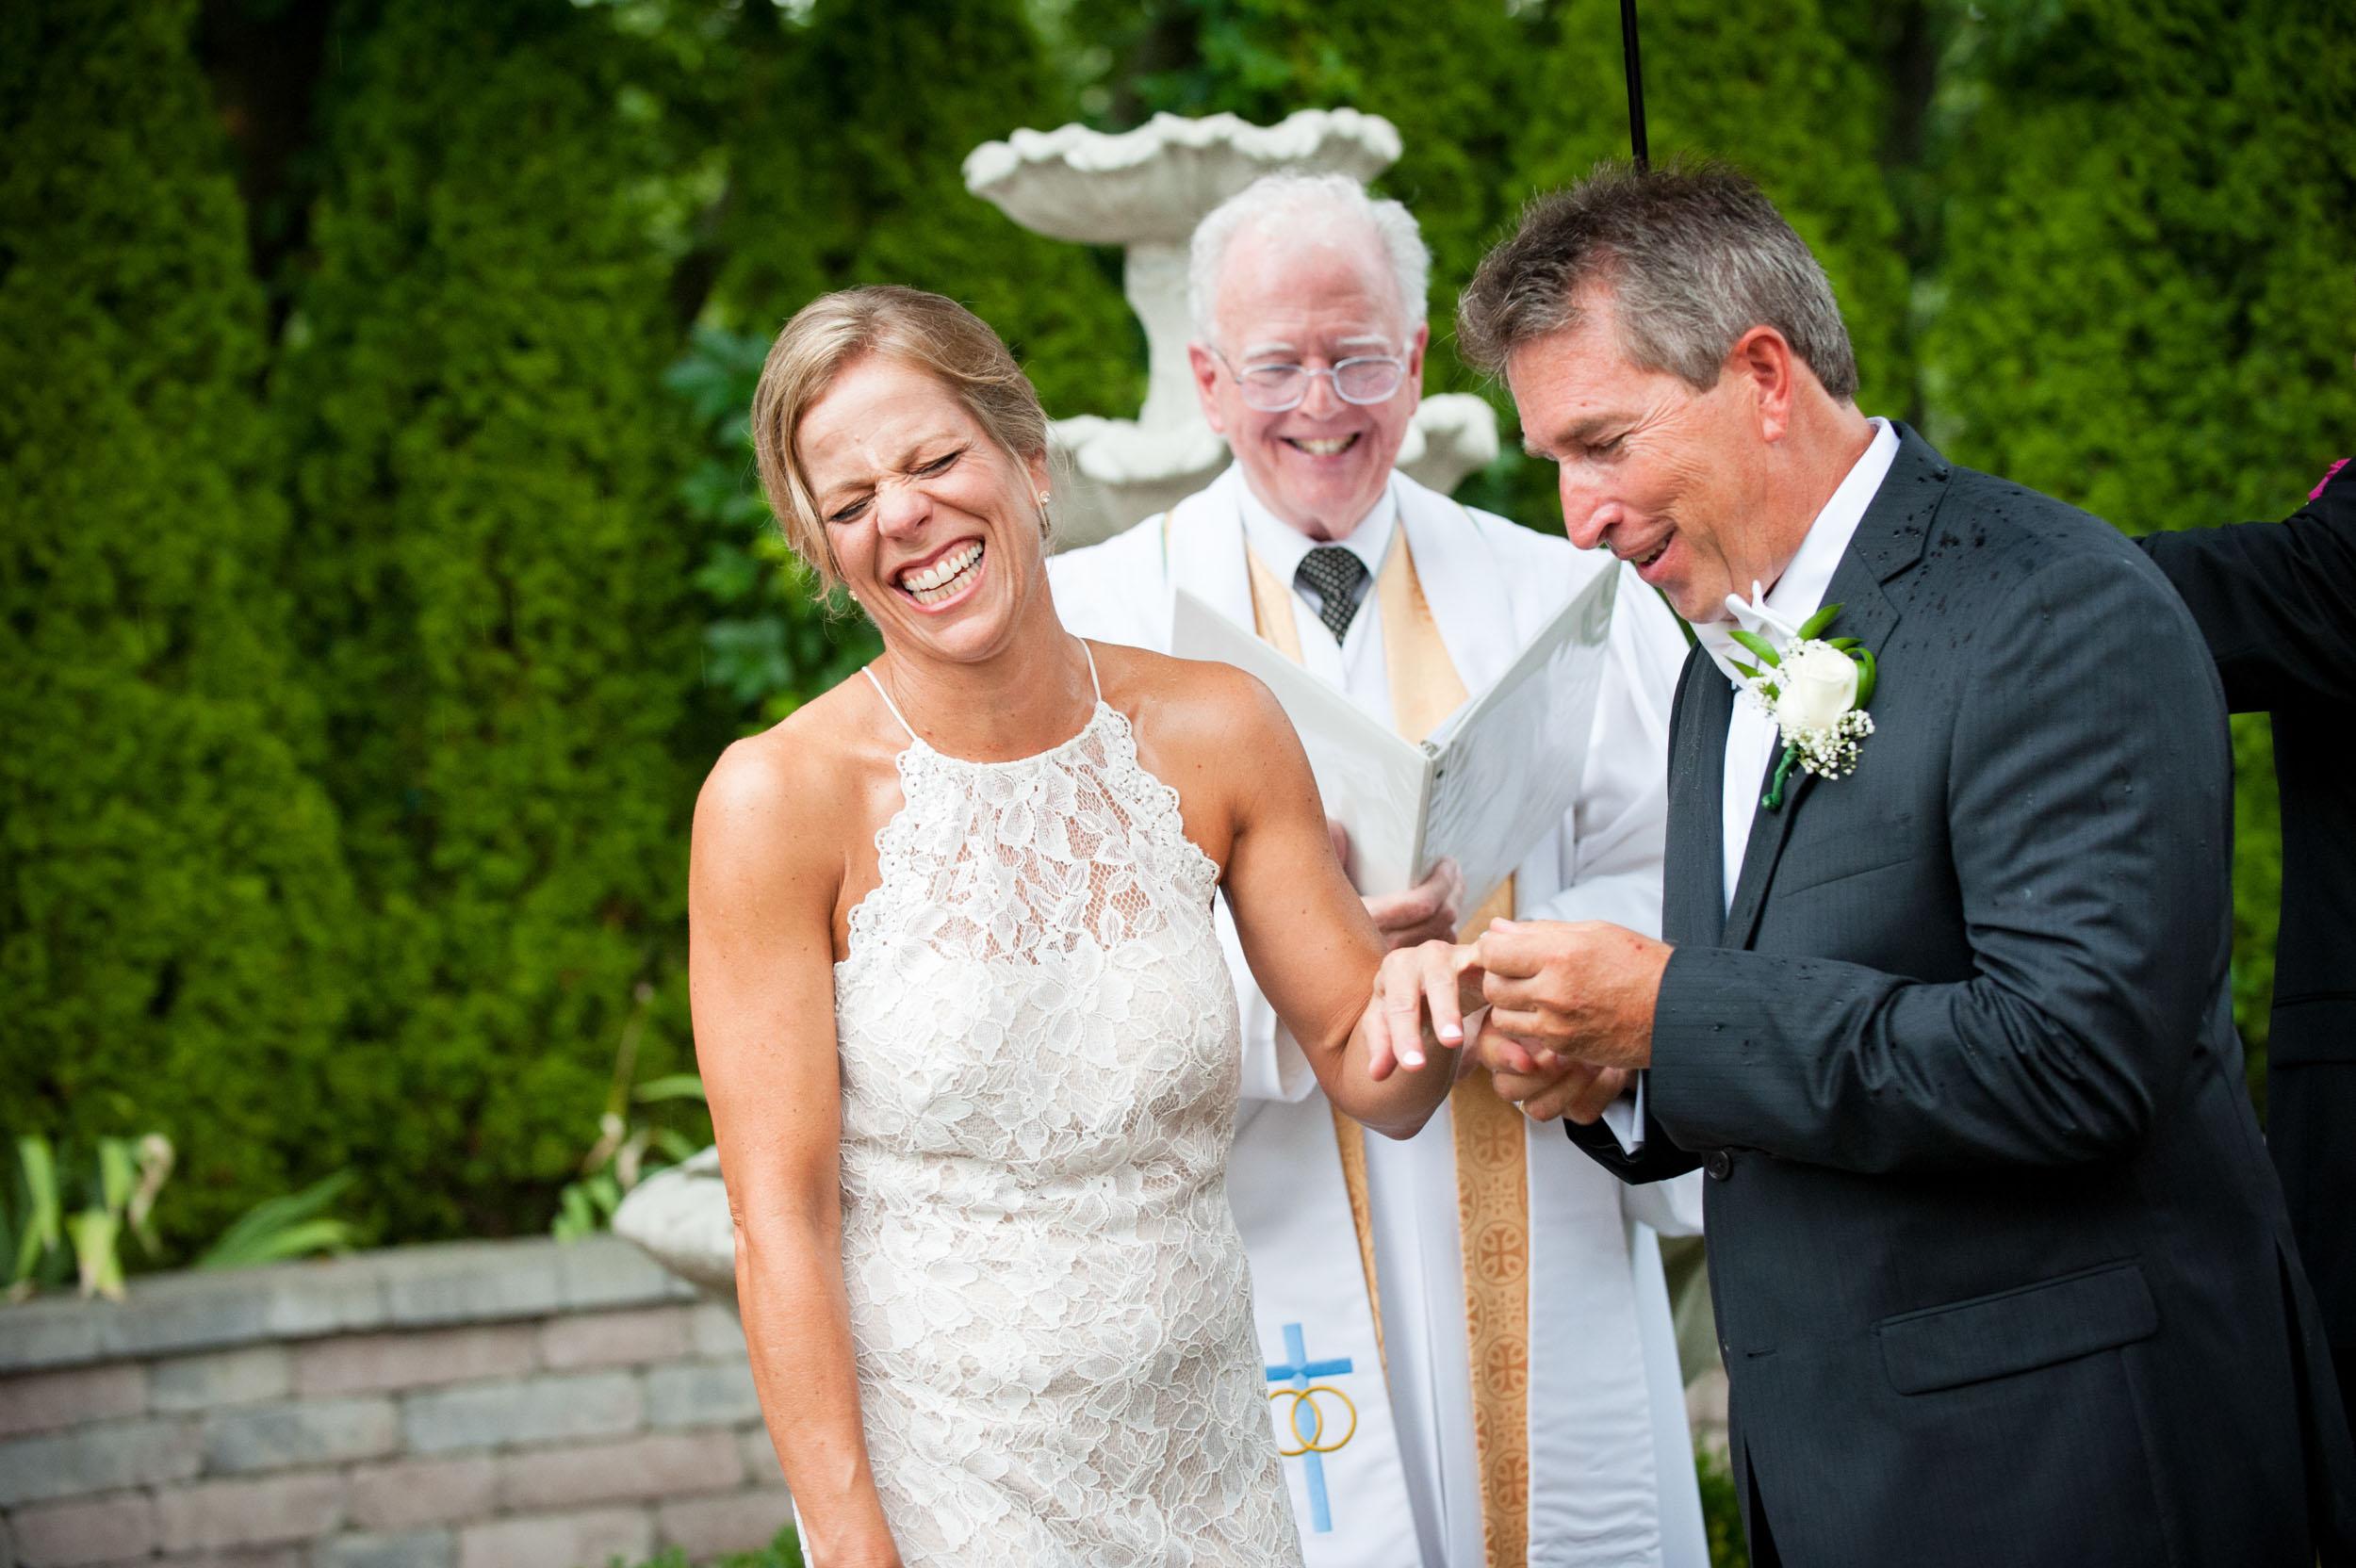 Wedding114PandP 242*2-2.jpg